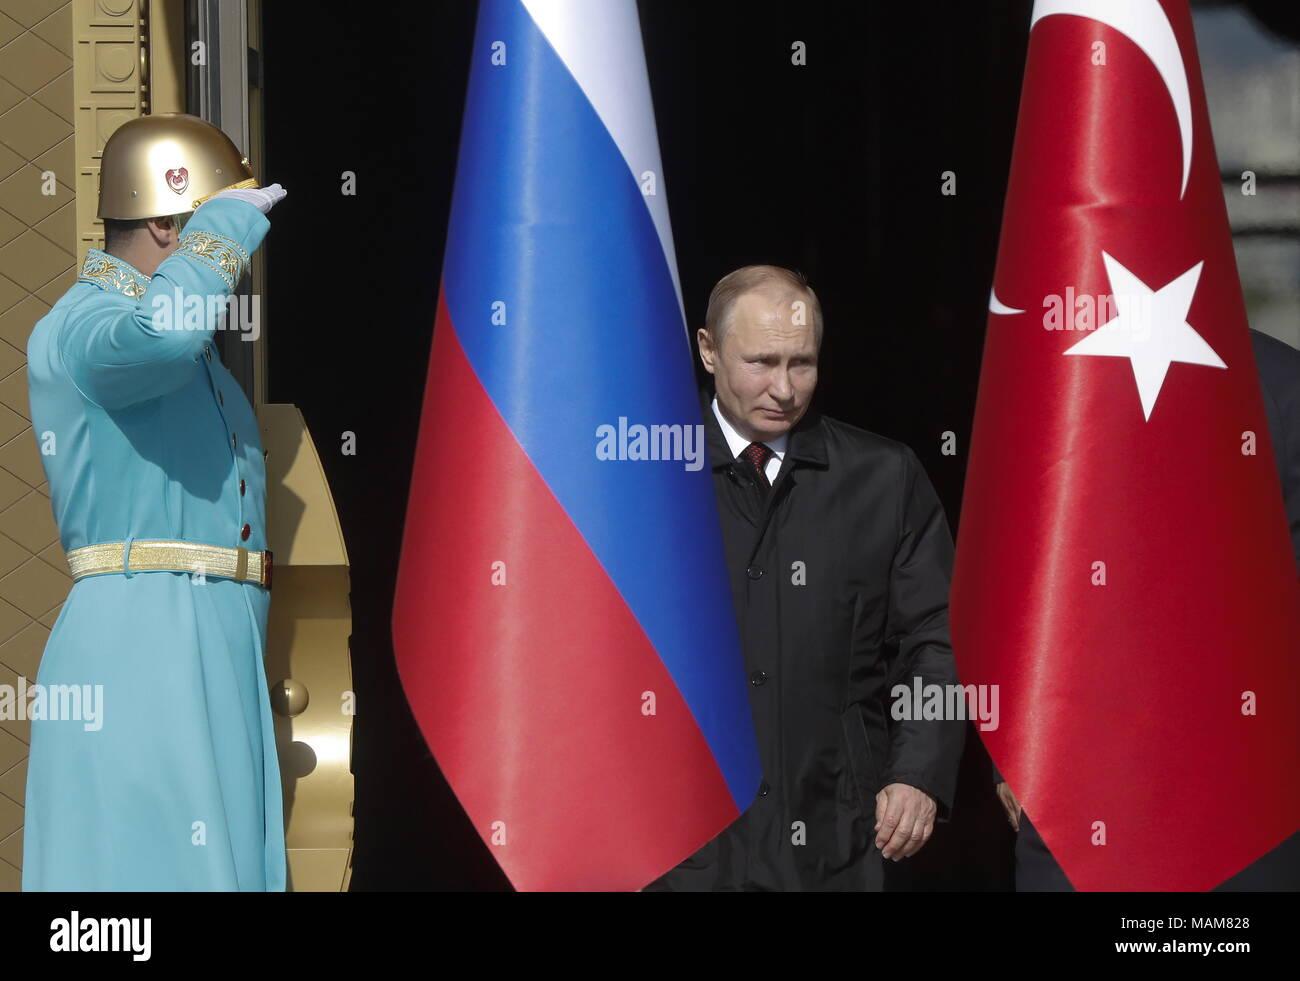 Ankara, Turkey. 03rd Apr, 2018. ANKARA, TURKEY - APRIL 3, 2018: Russia's President Vladimir Putin (R) during a welcome ceremony by Turkey's Presidential Palace. Mikhail Metzel/TASS Credit: ITAR-TASS News Agency/Alamy Live News - Stock Image